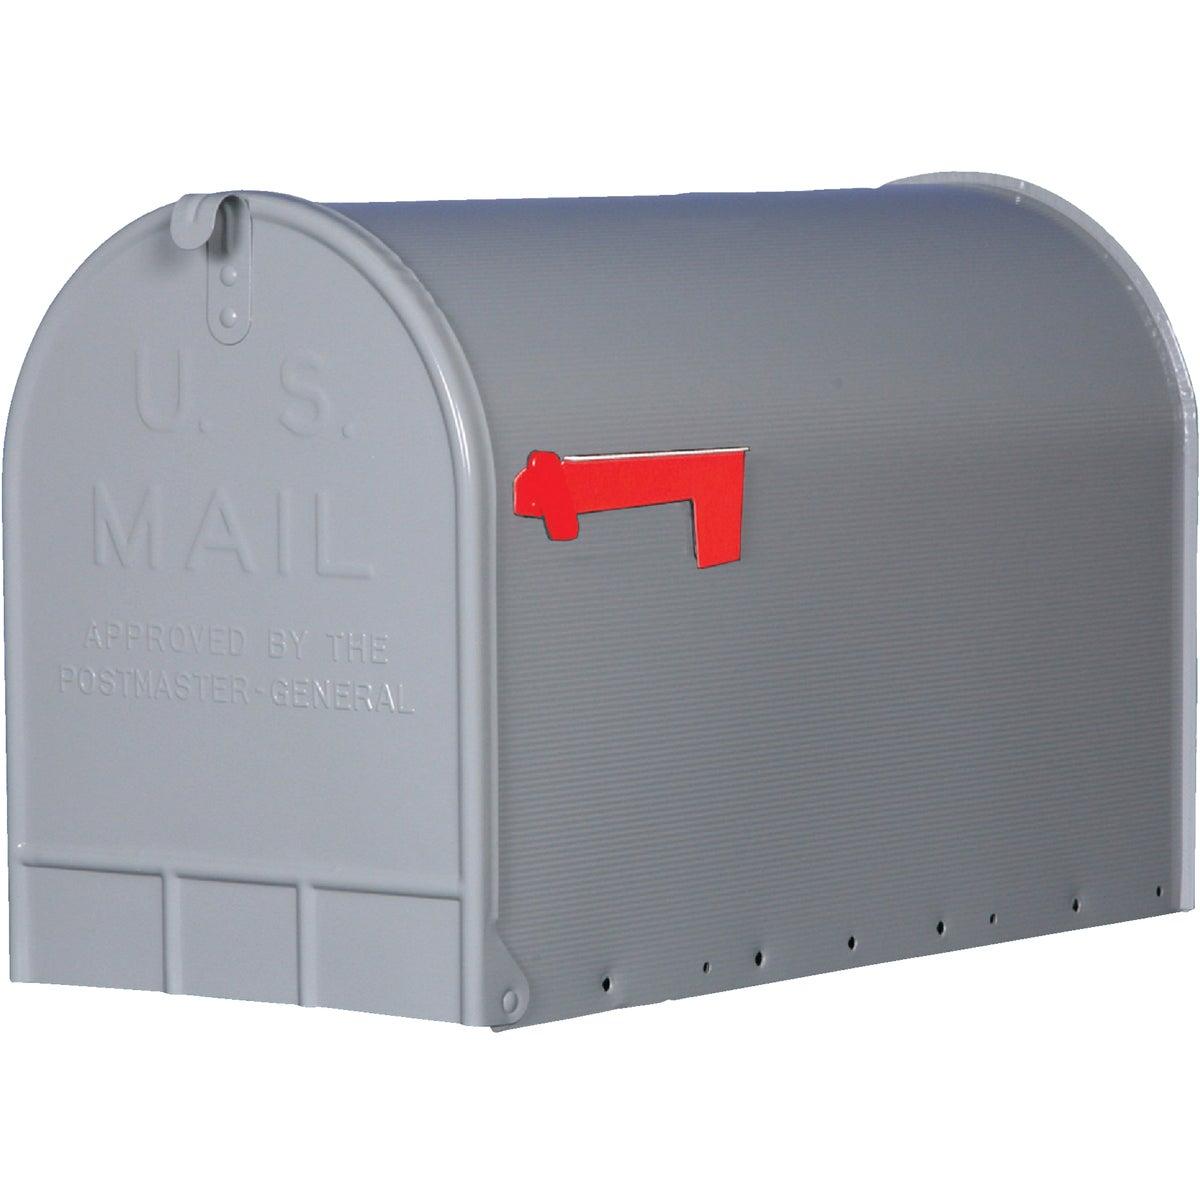 GRAY T3 MAILBOX